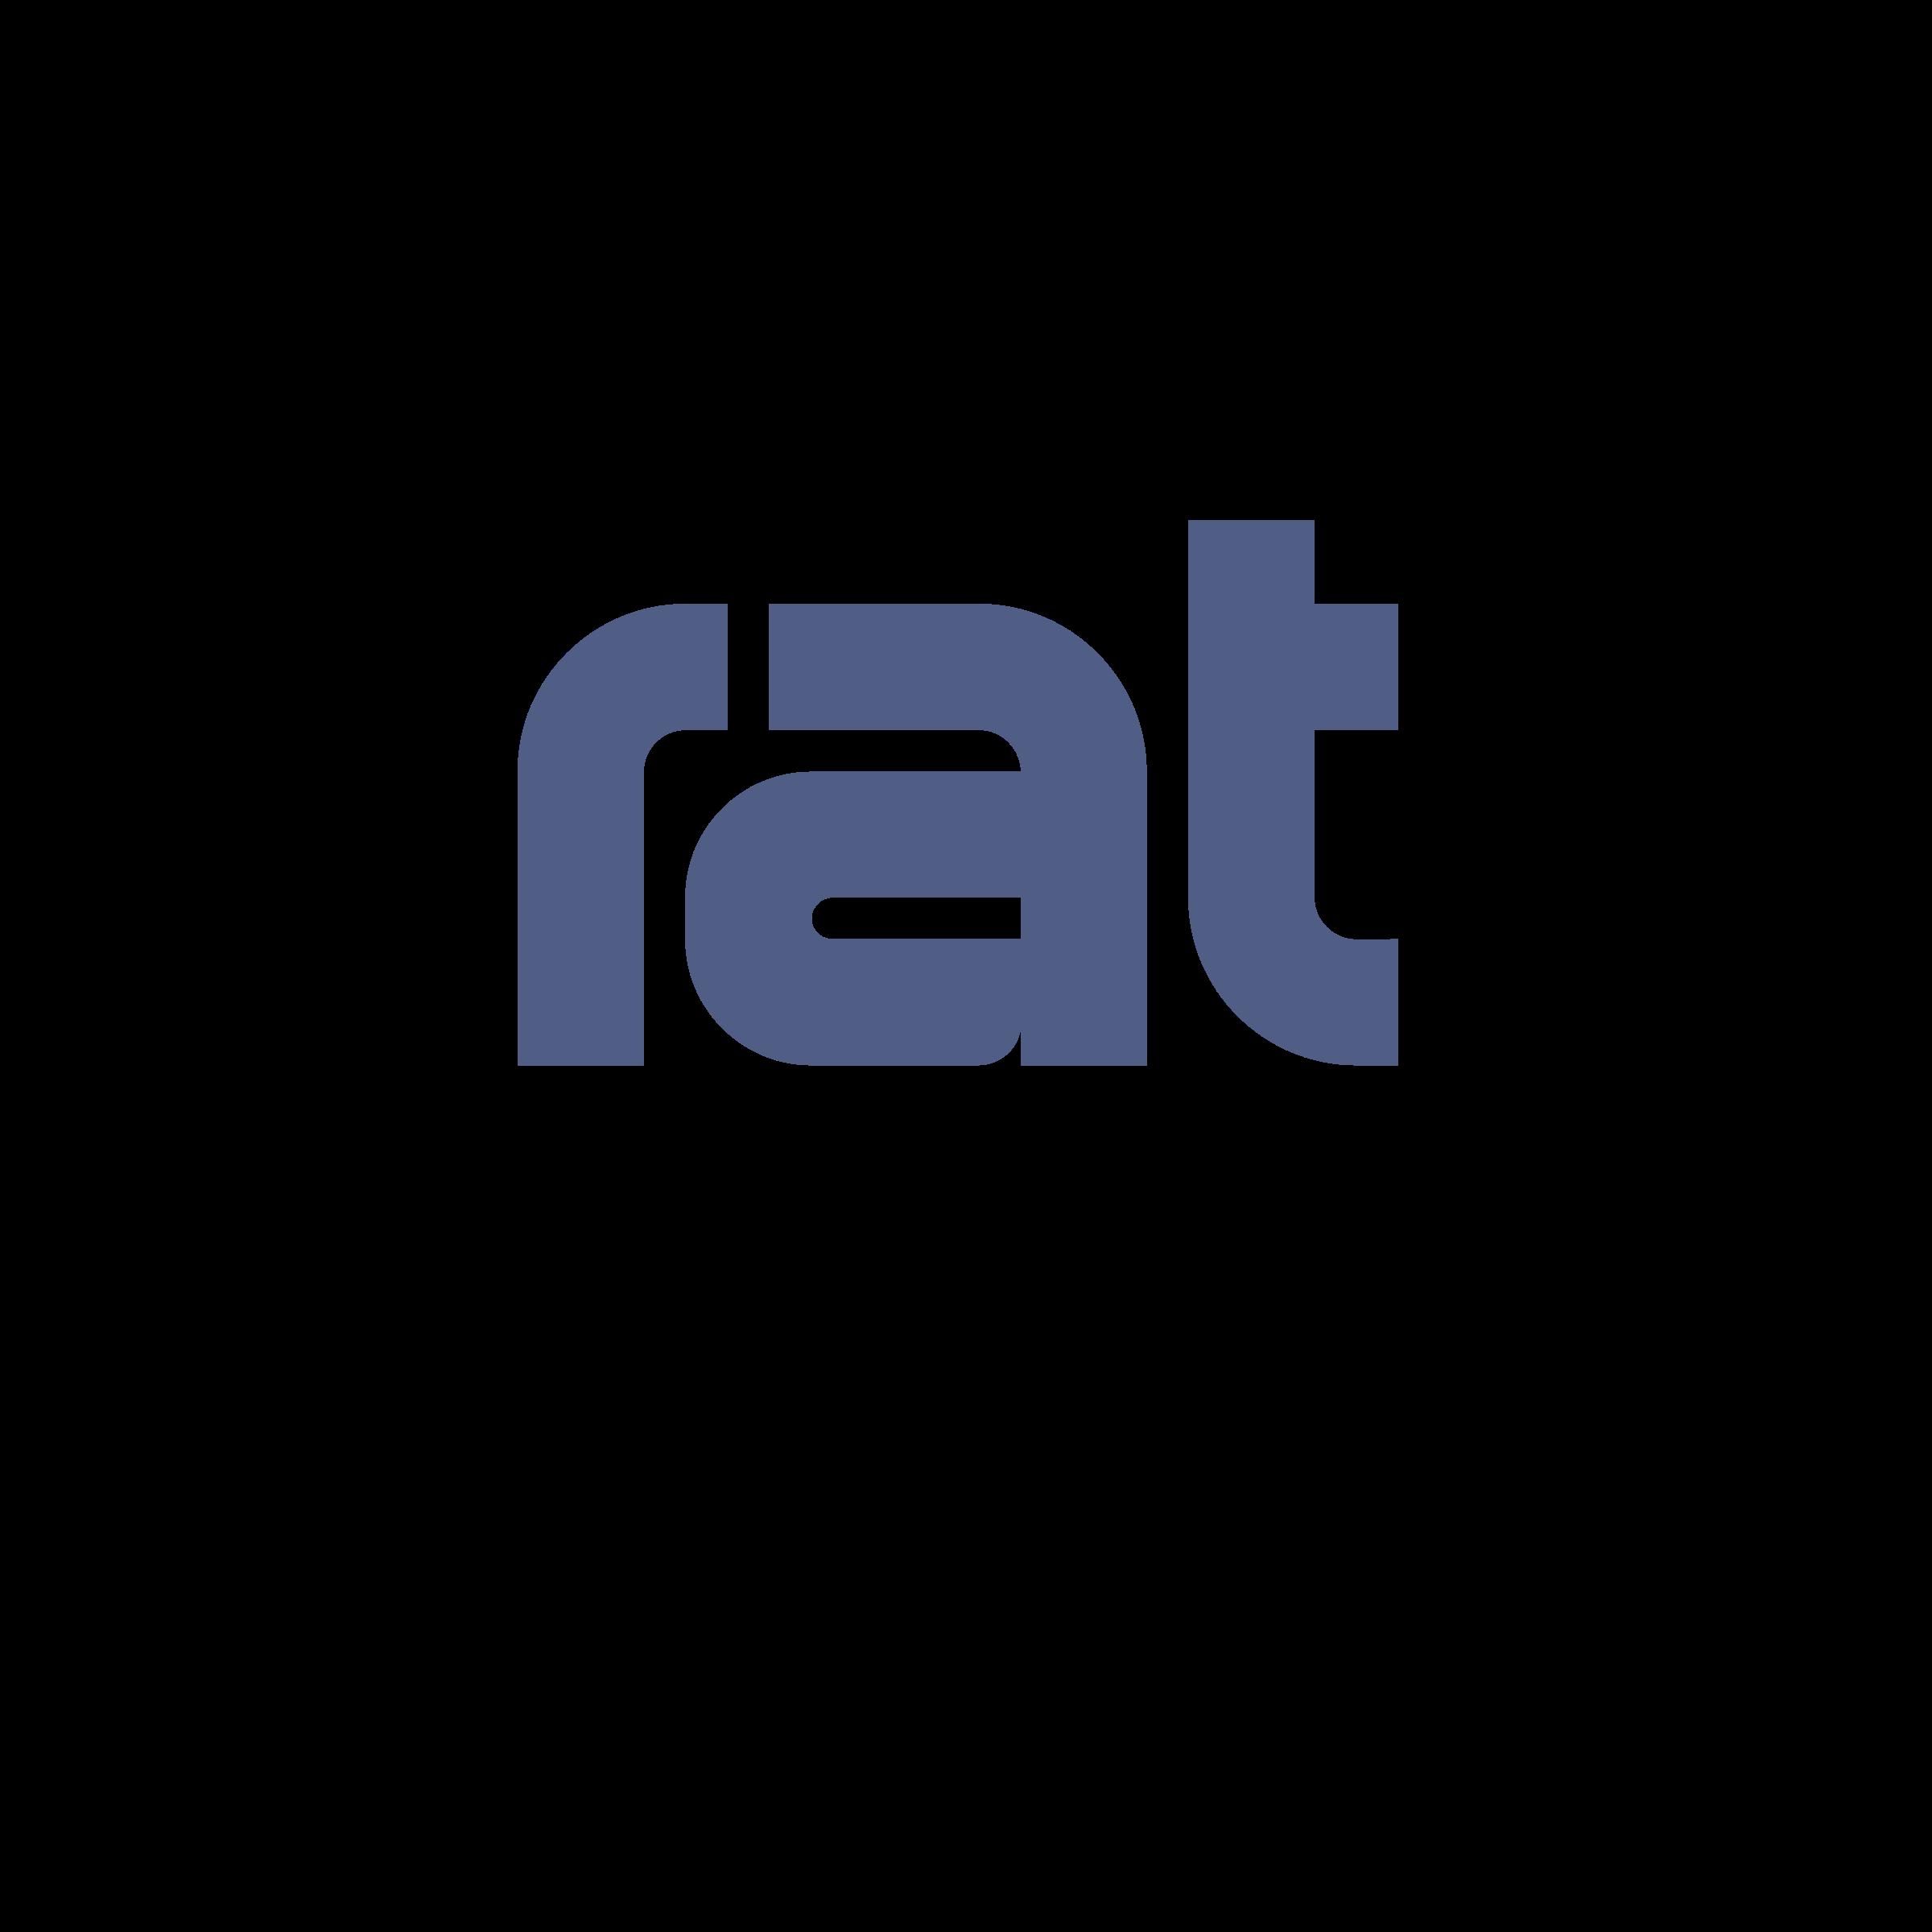 rat electronics logo png transparent svg vector freebie supply rh freebiesupply com logos for technology and electronics logos for electronics company